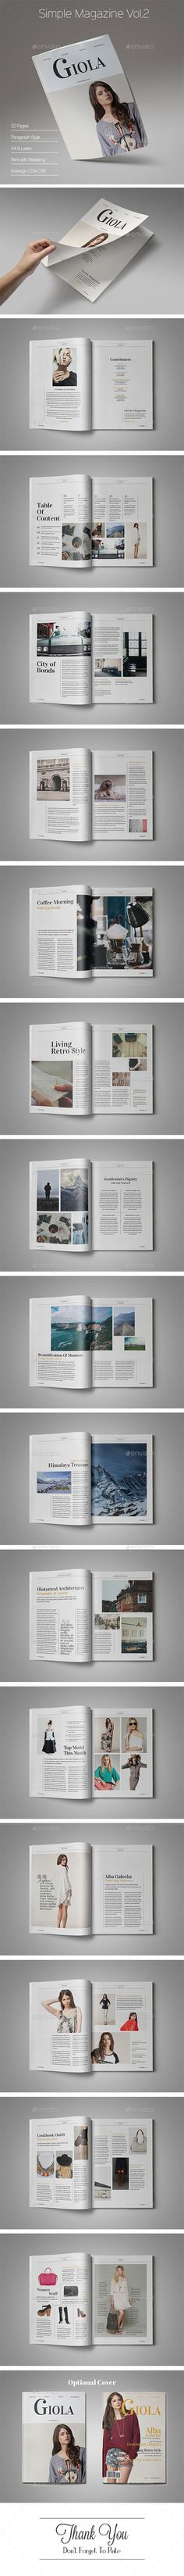 Simple Magazine Vol.2 - Magazines Print Templates Download here : https://graphicriver.net/item/simple-magazine-vol2/16565842?s_rank=186&ref=Al-fatih